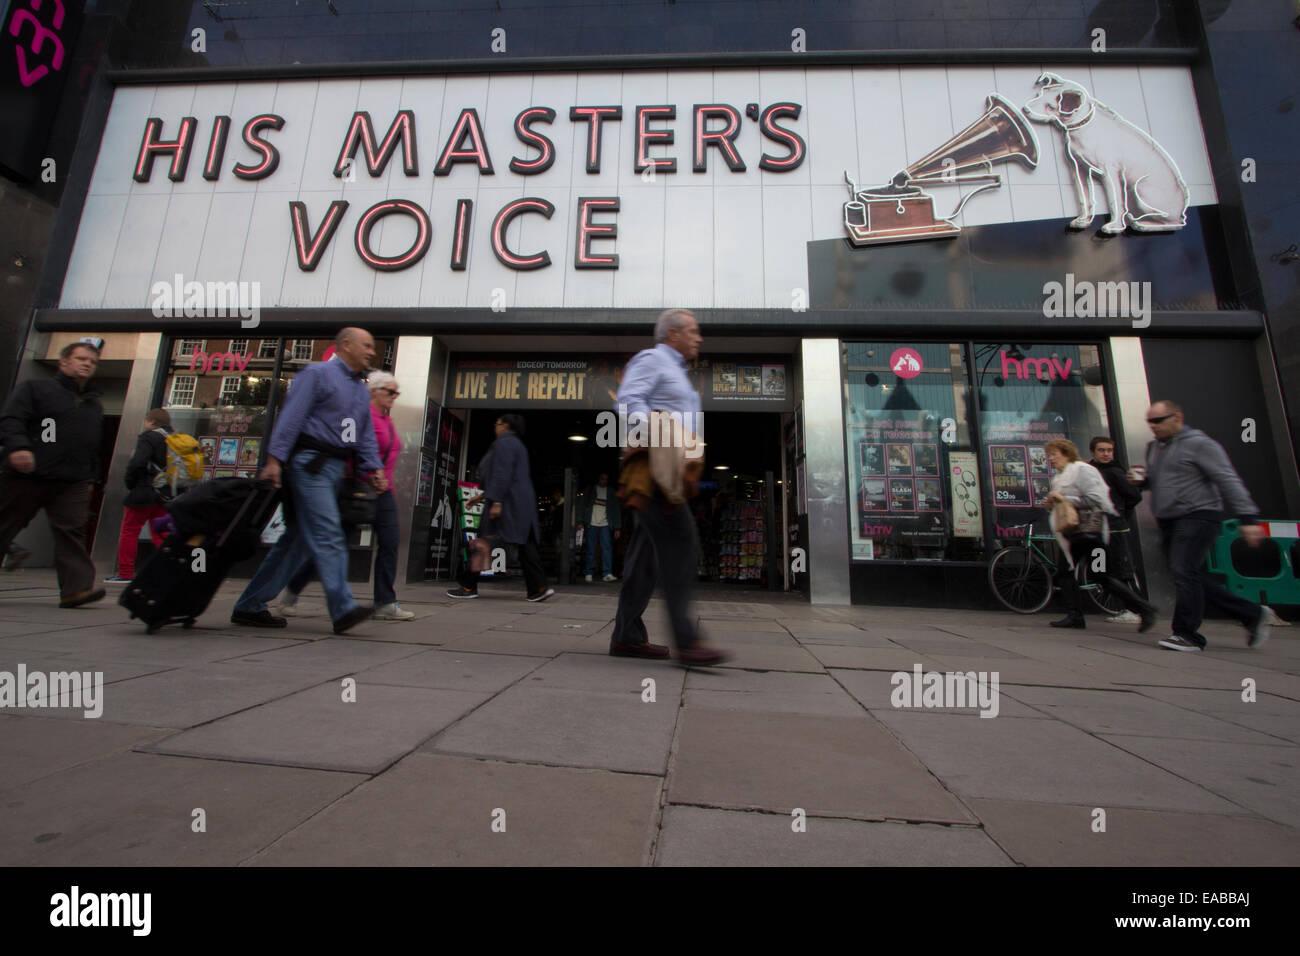 His Masters Voice HMV shop Oxford street - Stock Image